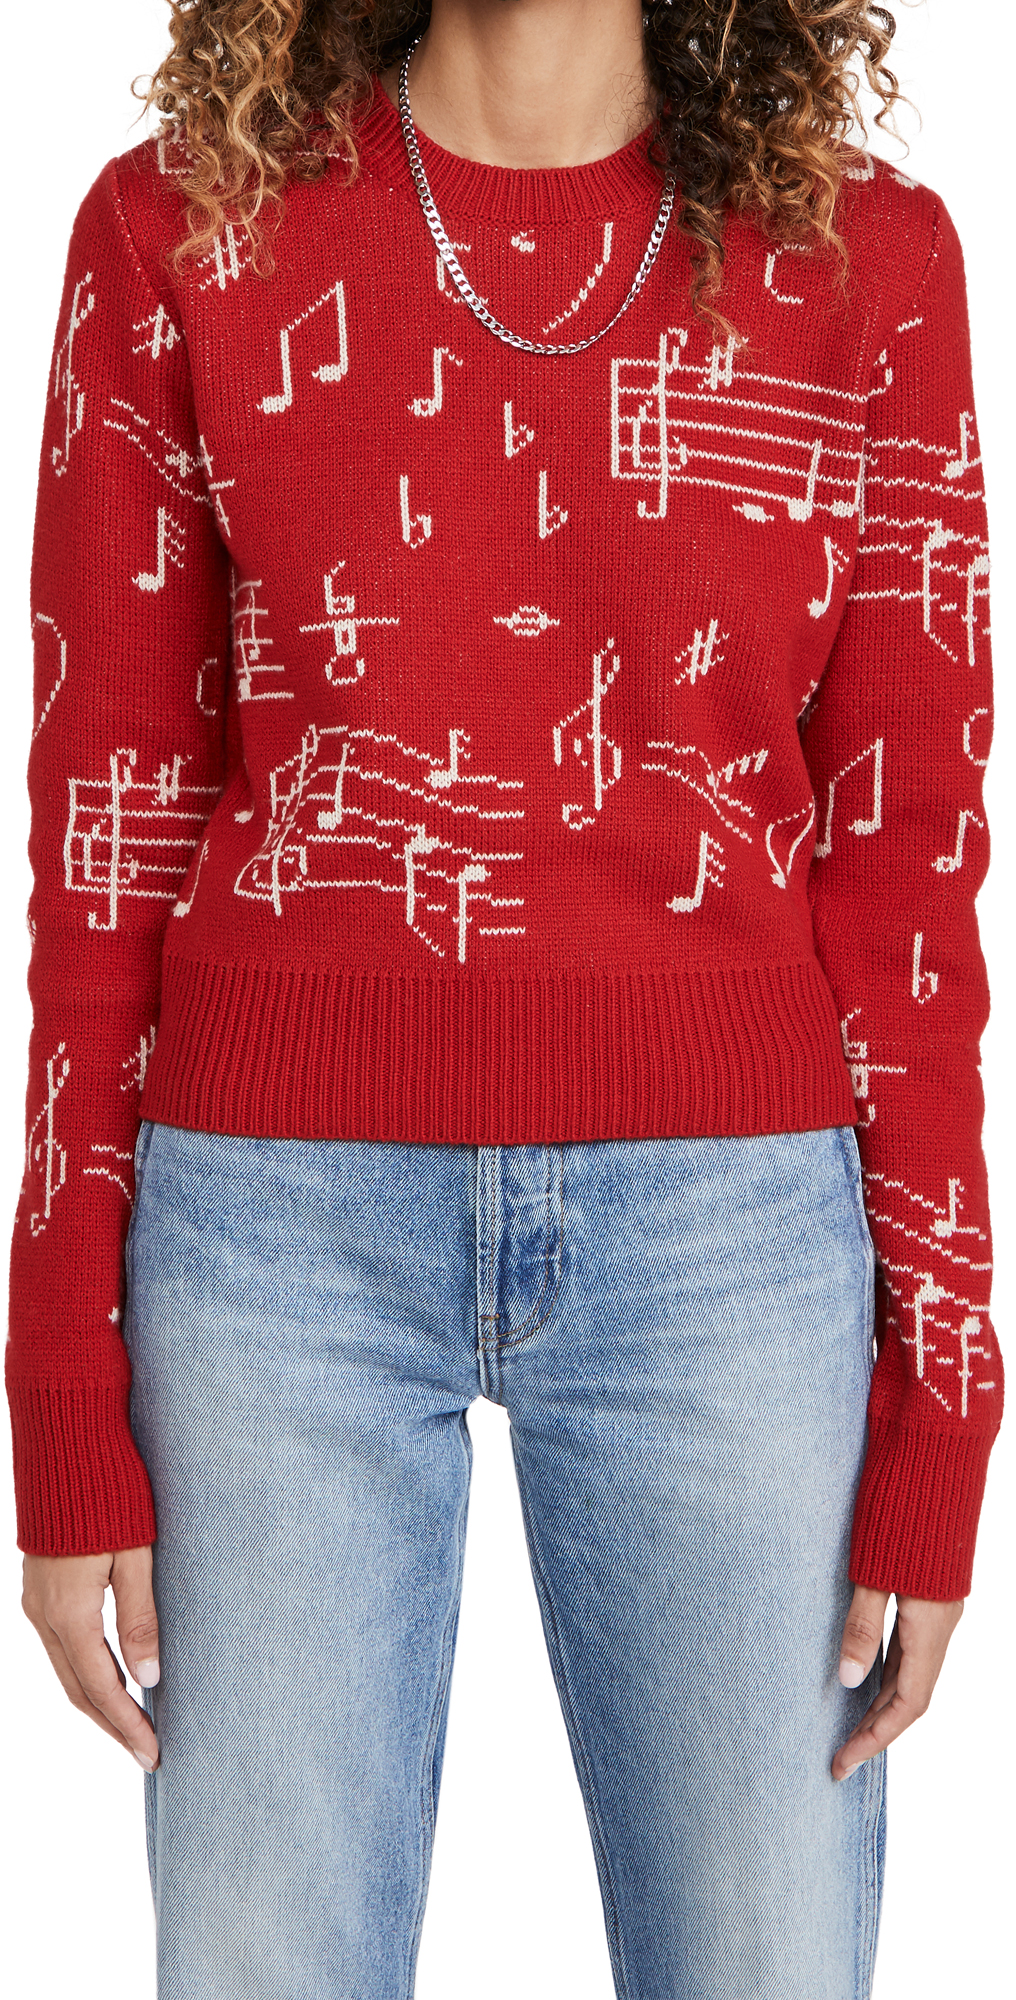 RE/DONE 60s Shrunken Sweater